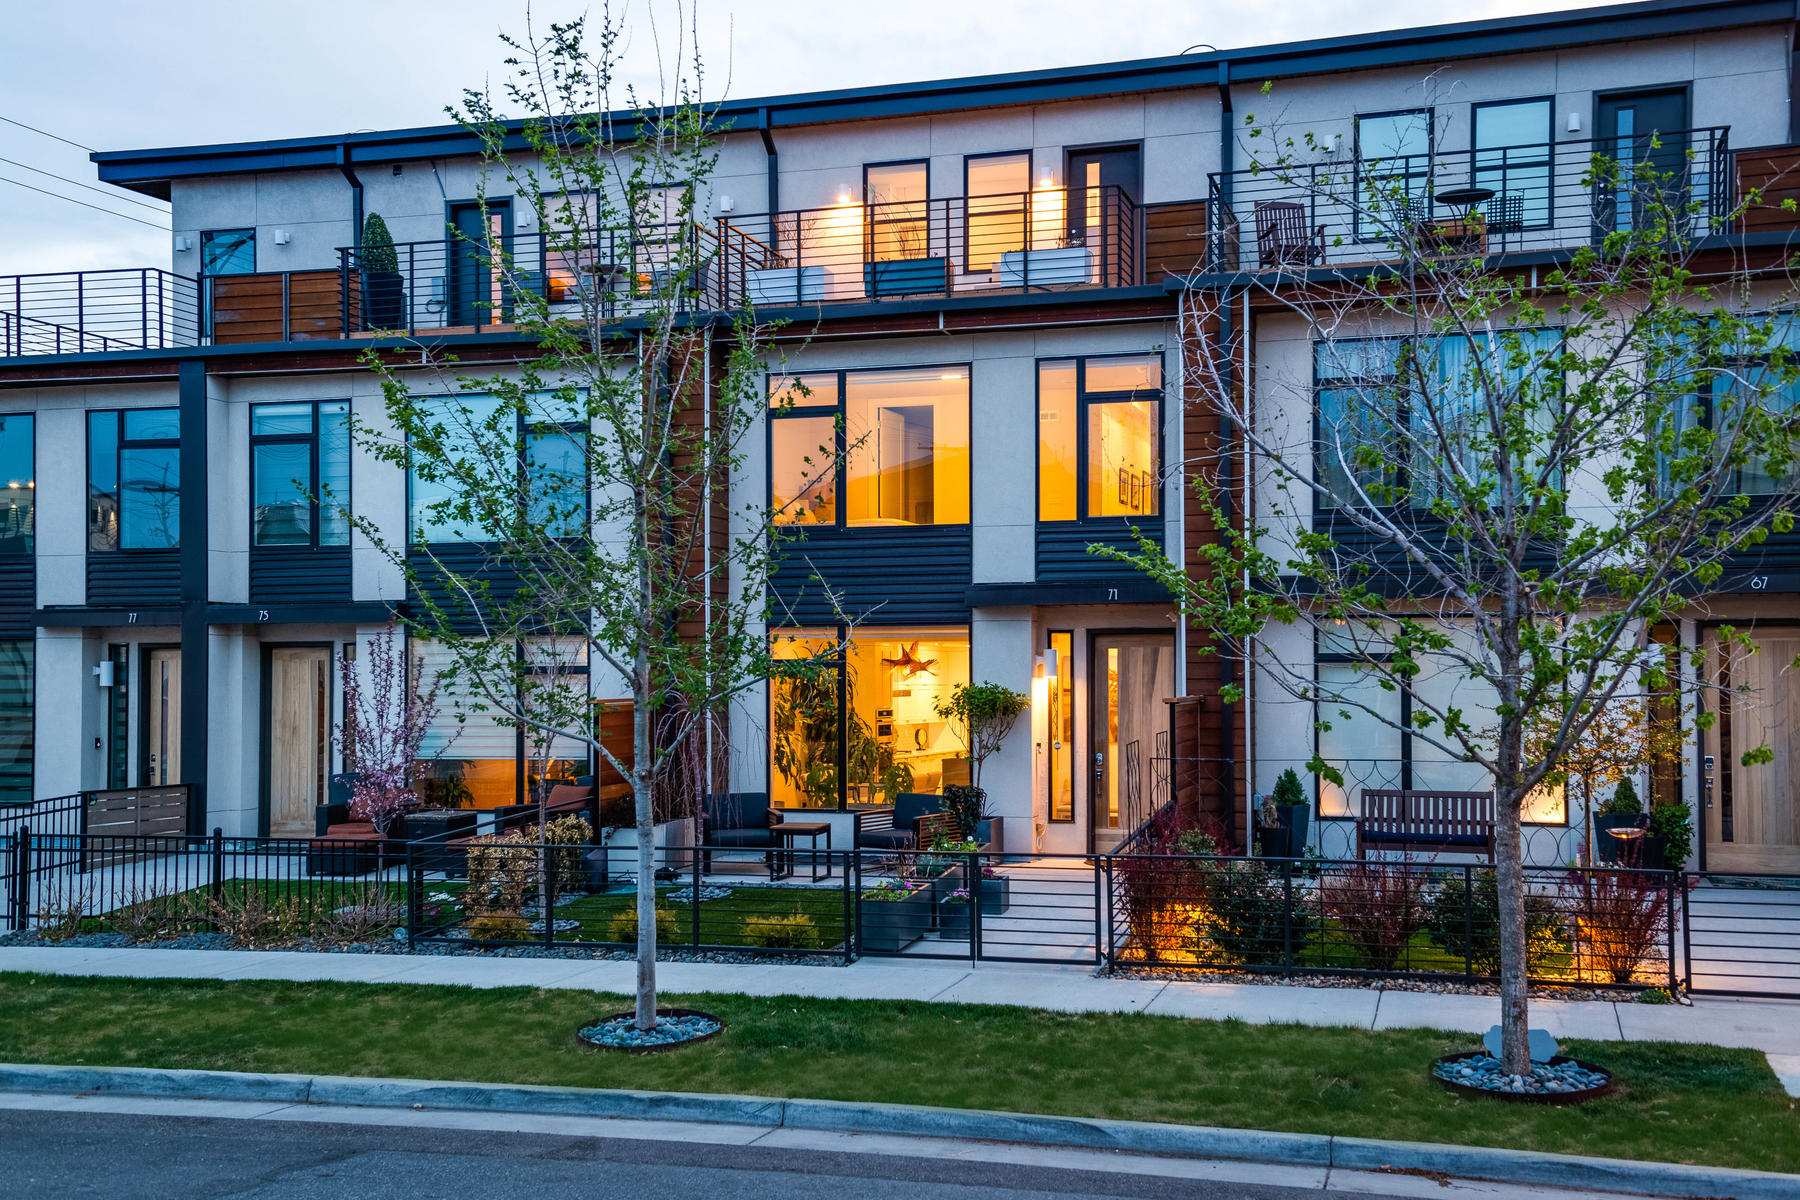 townhouses por un Venta en 71 South Jackson Street Denver, Colorado 80209 Estados Unidos